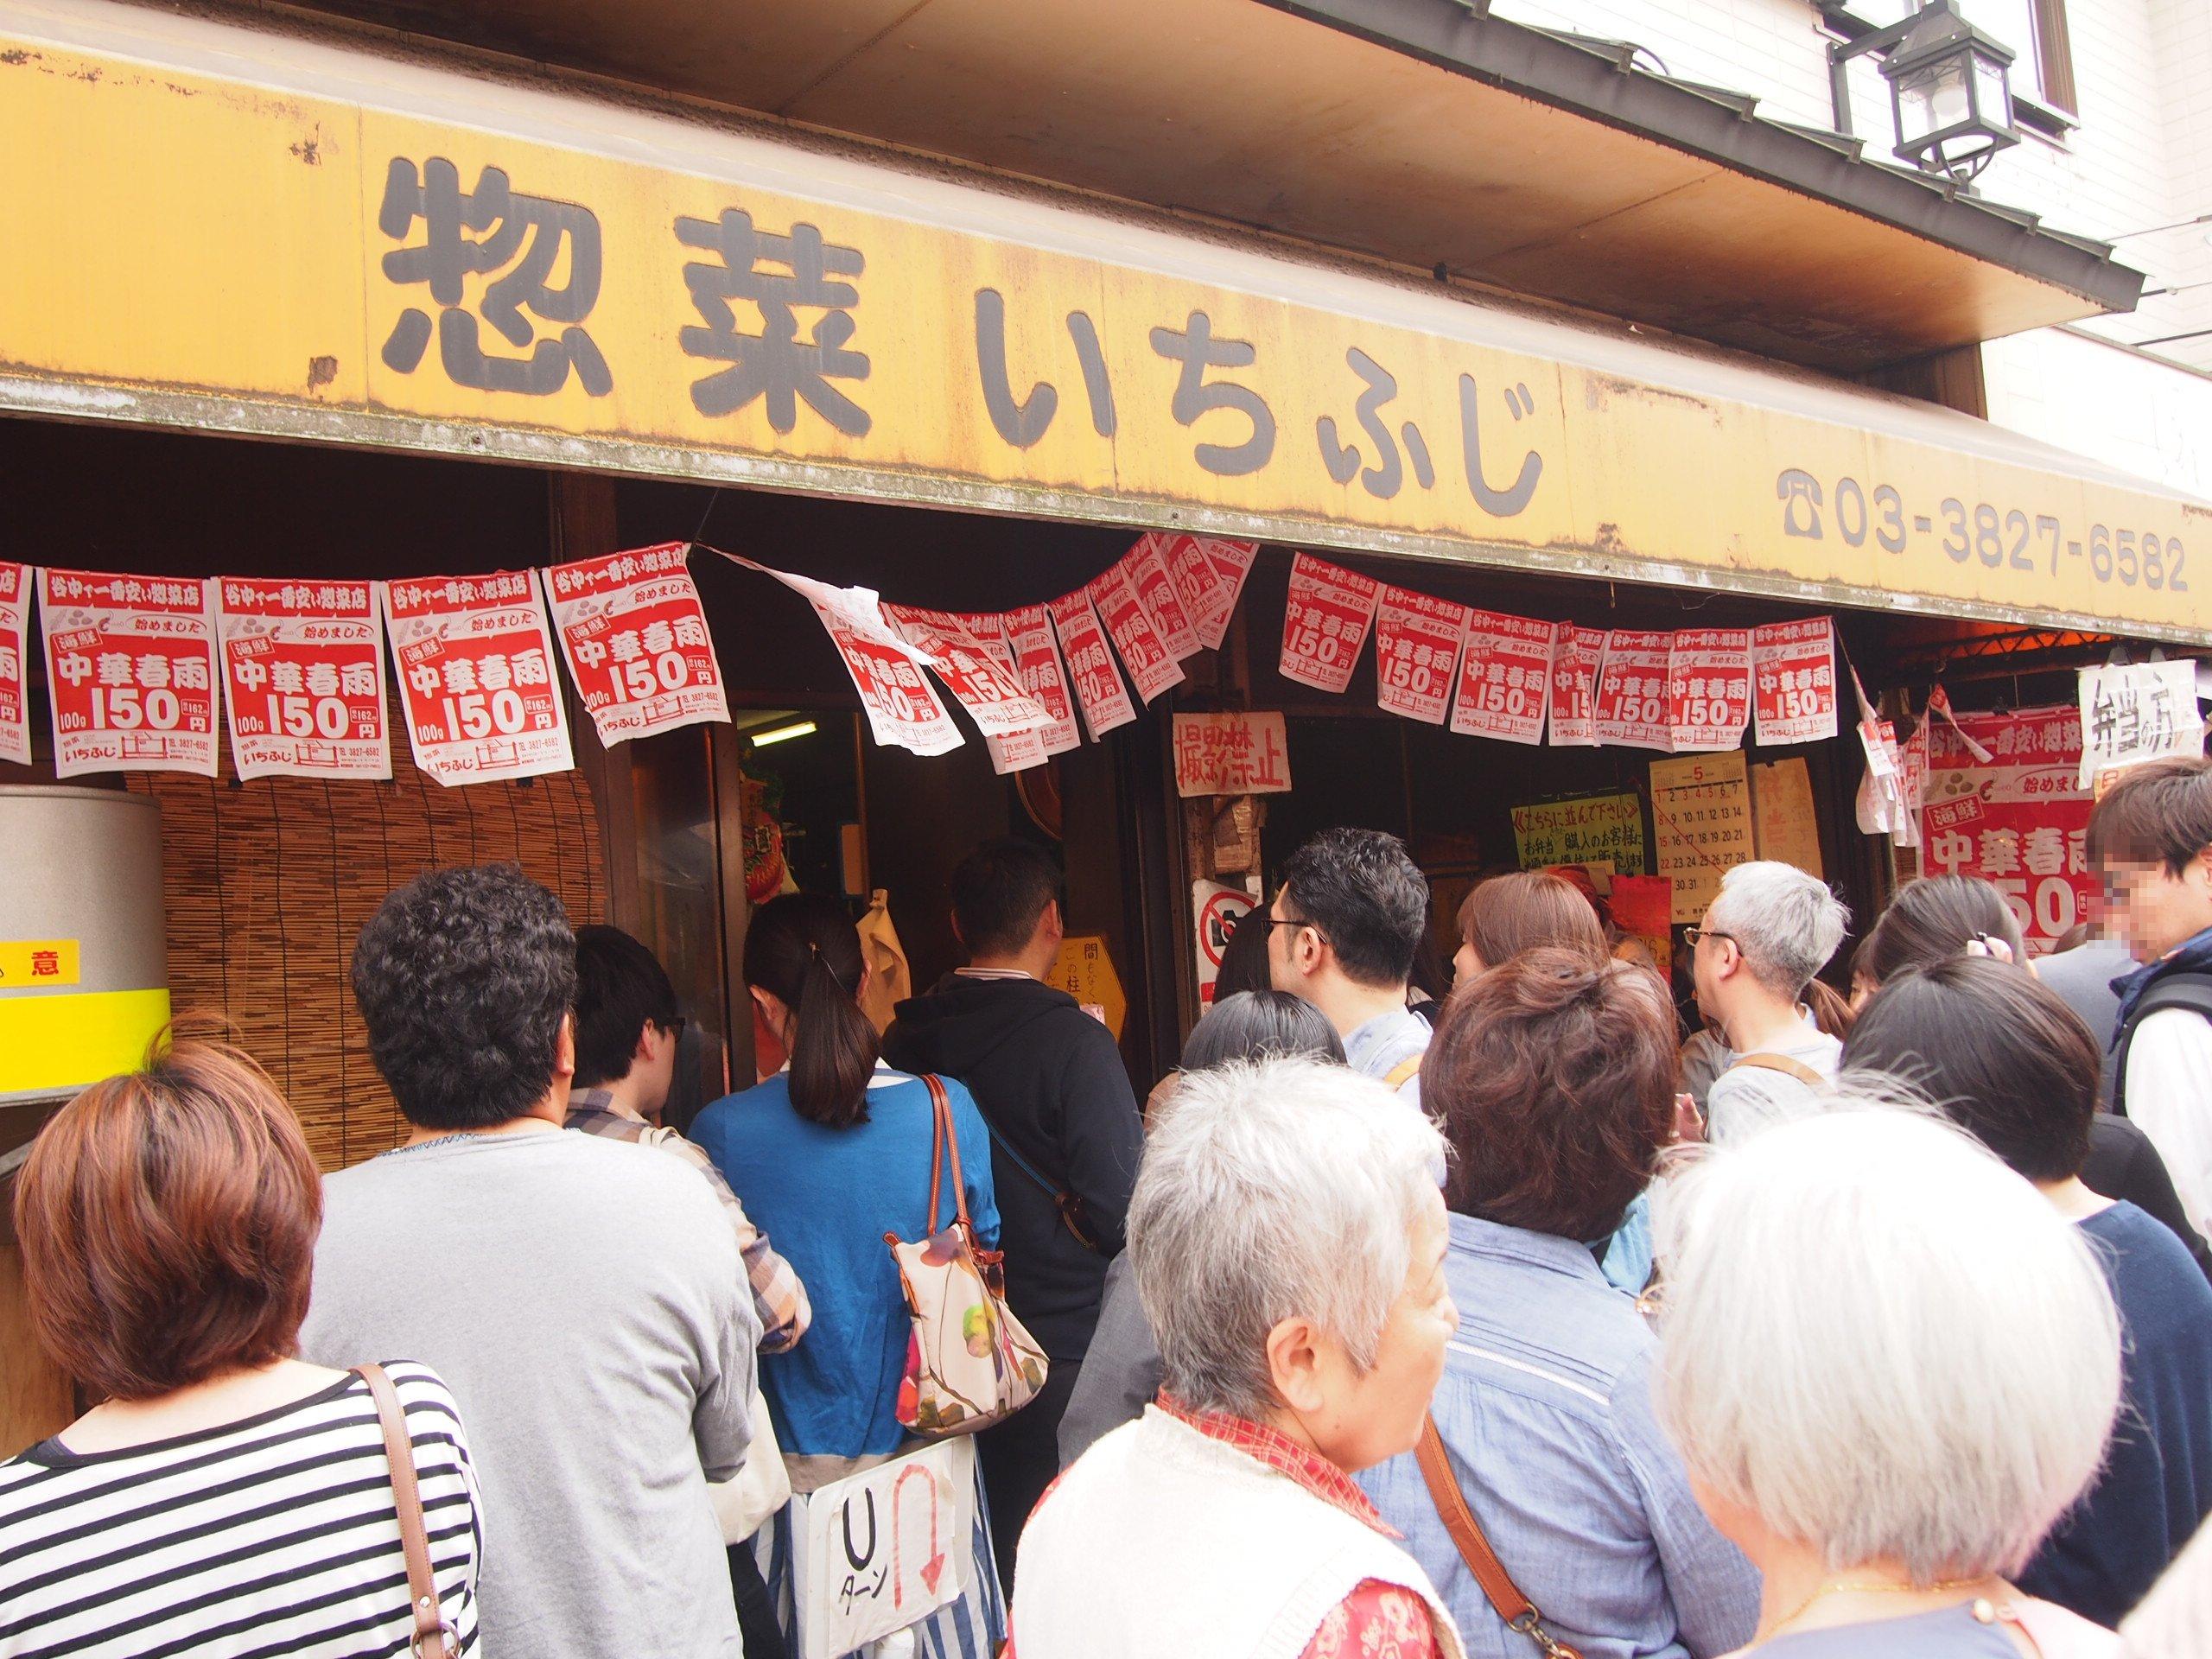 Ichifuji | Restaurants in Sendagi, Tokyo